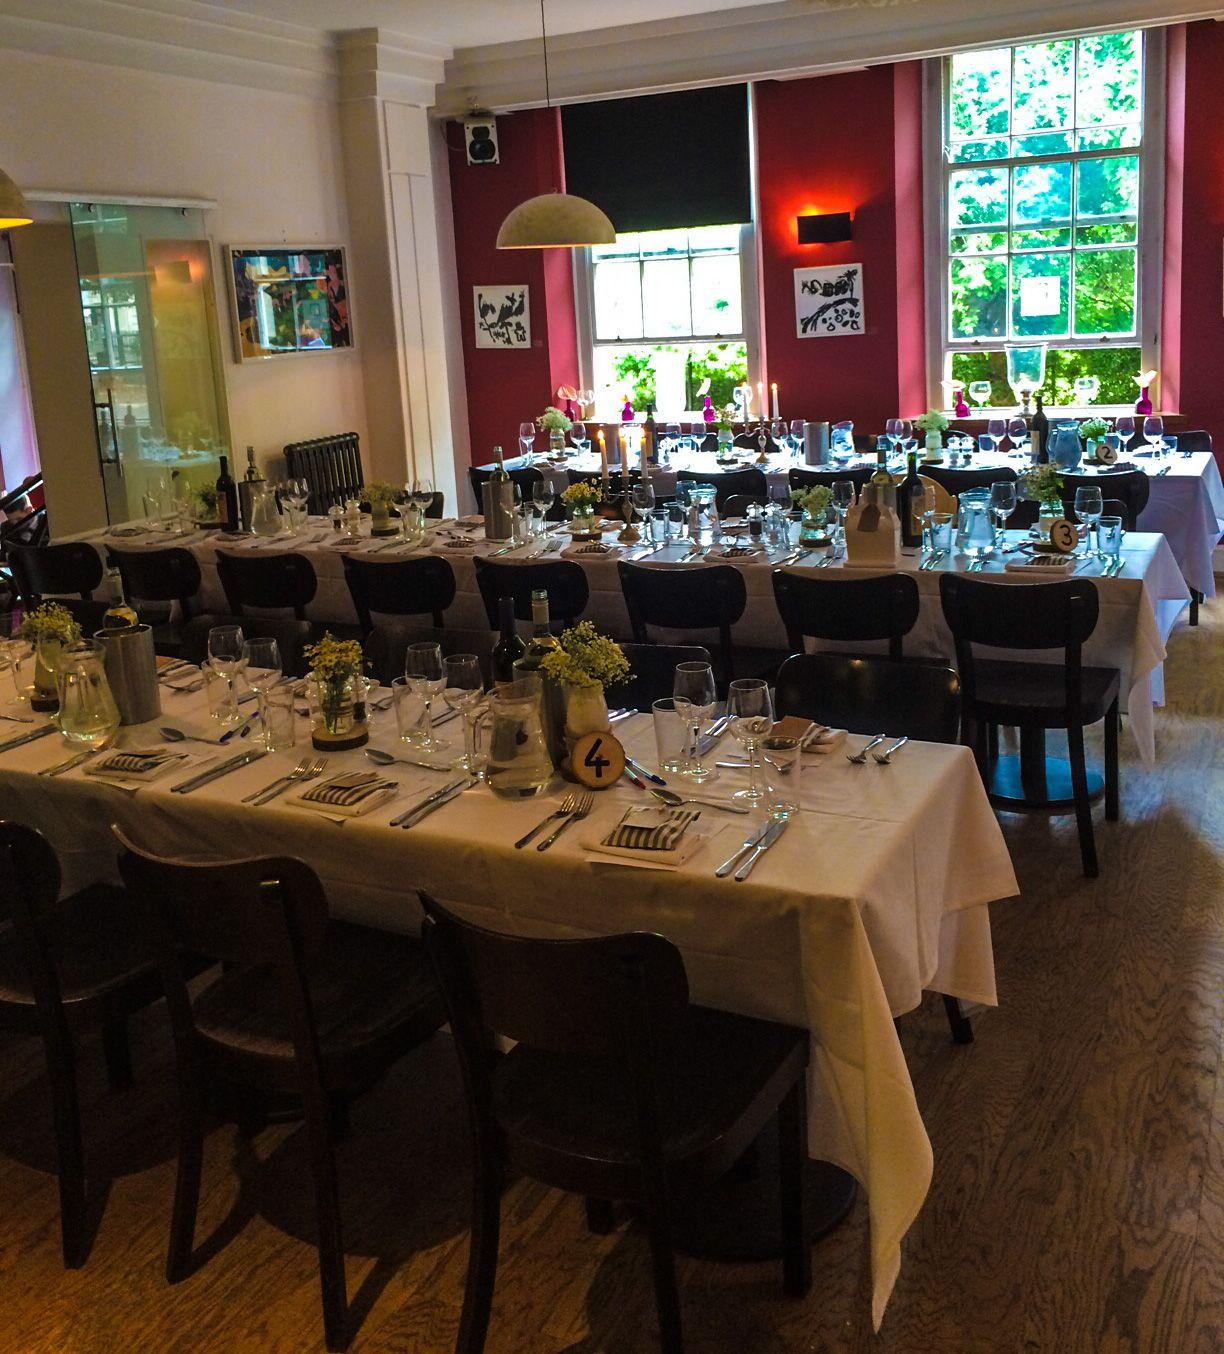 Civil Wedding Ideas: Beautiful Table Decoration Ideas For Your Wedding